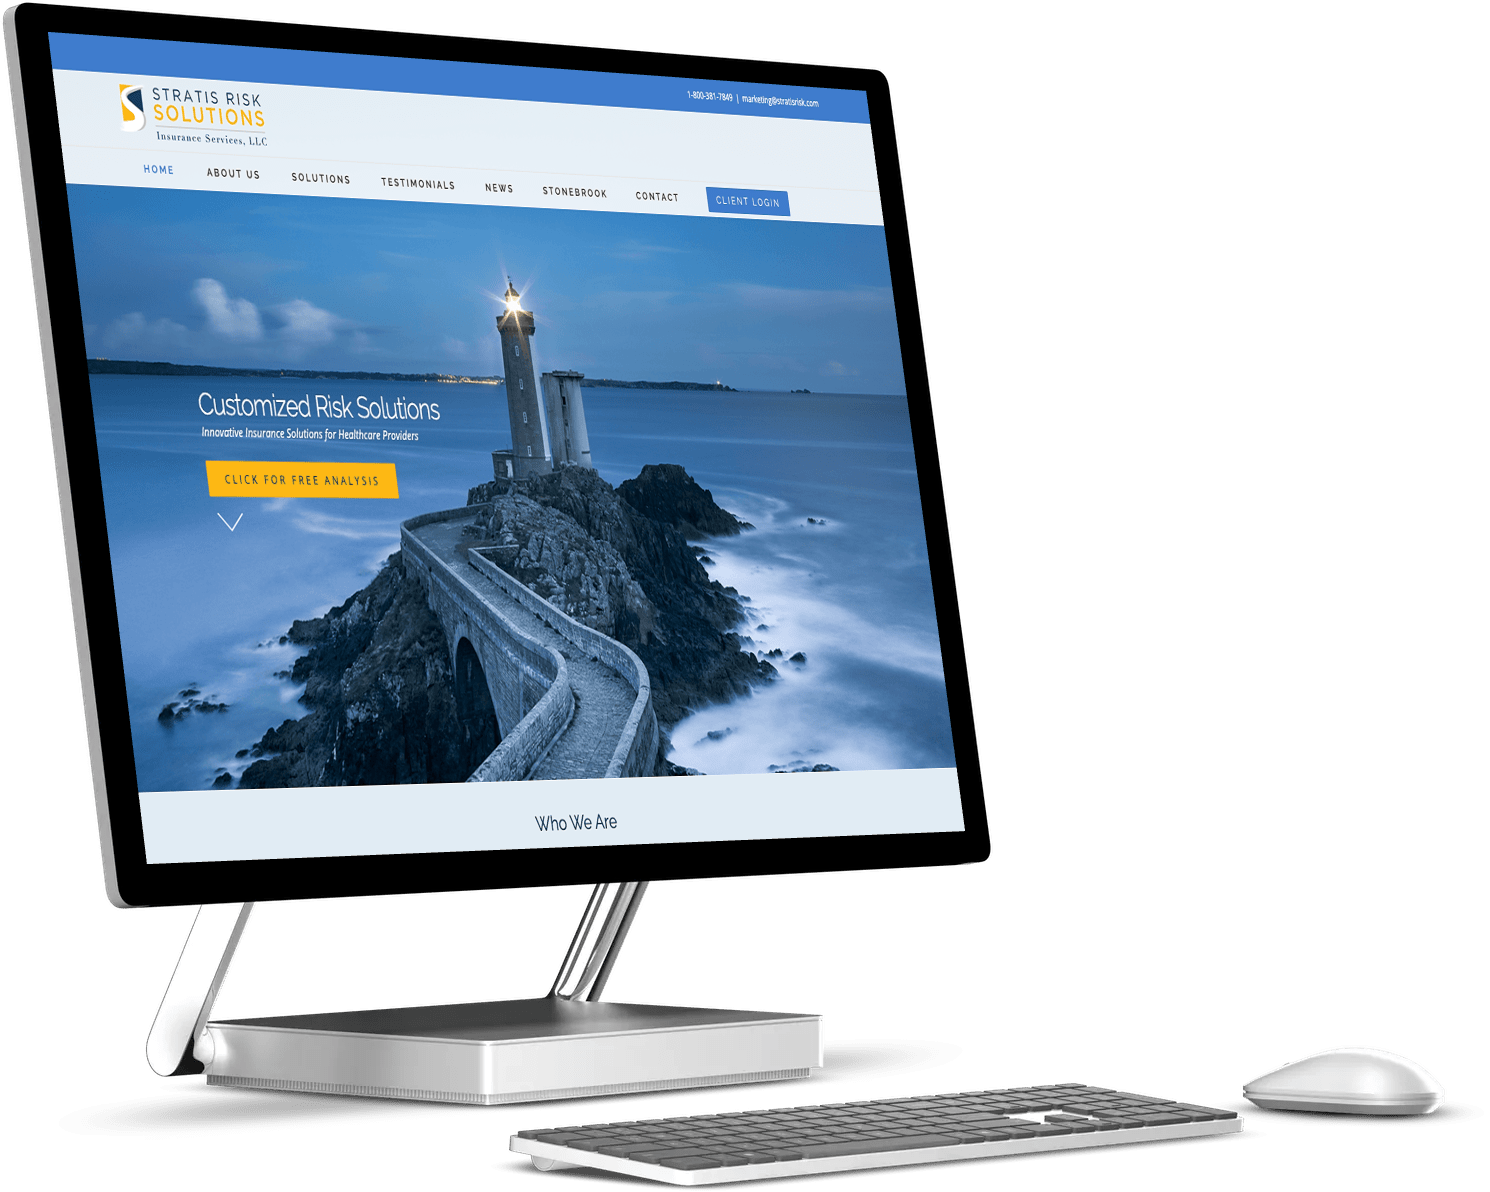 The Hawaii Angency Web Design Insurance Company Case Studies